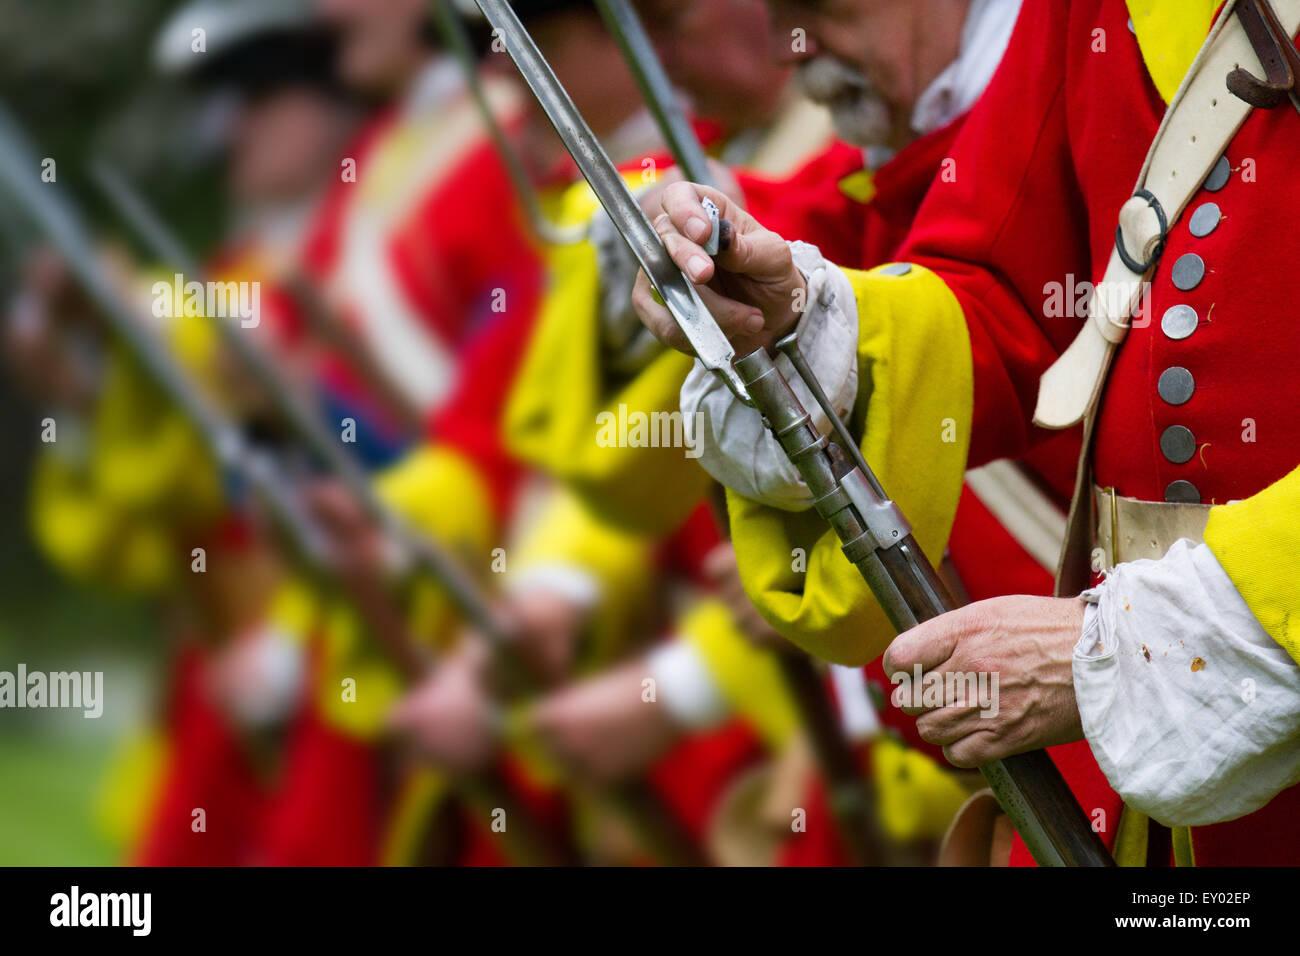 Hoghton, Preston, Lancashire, UK. 18th July, 2015.   Redcoats & musketeers, muskets firing guns gun soldiers soldiers, Stock Photo